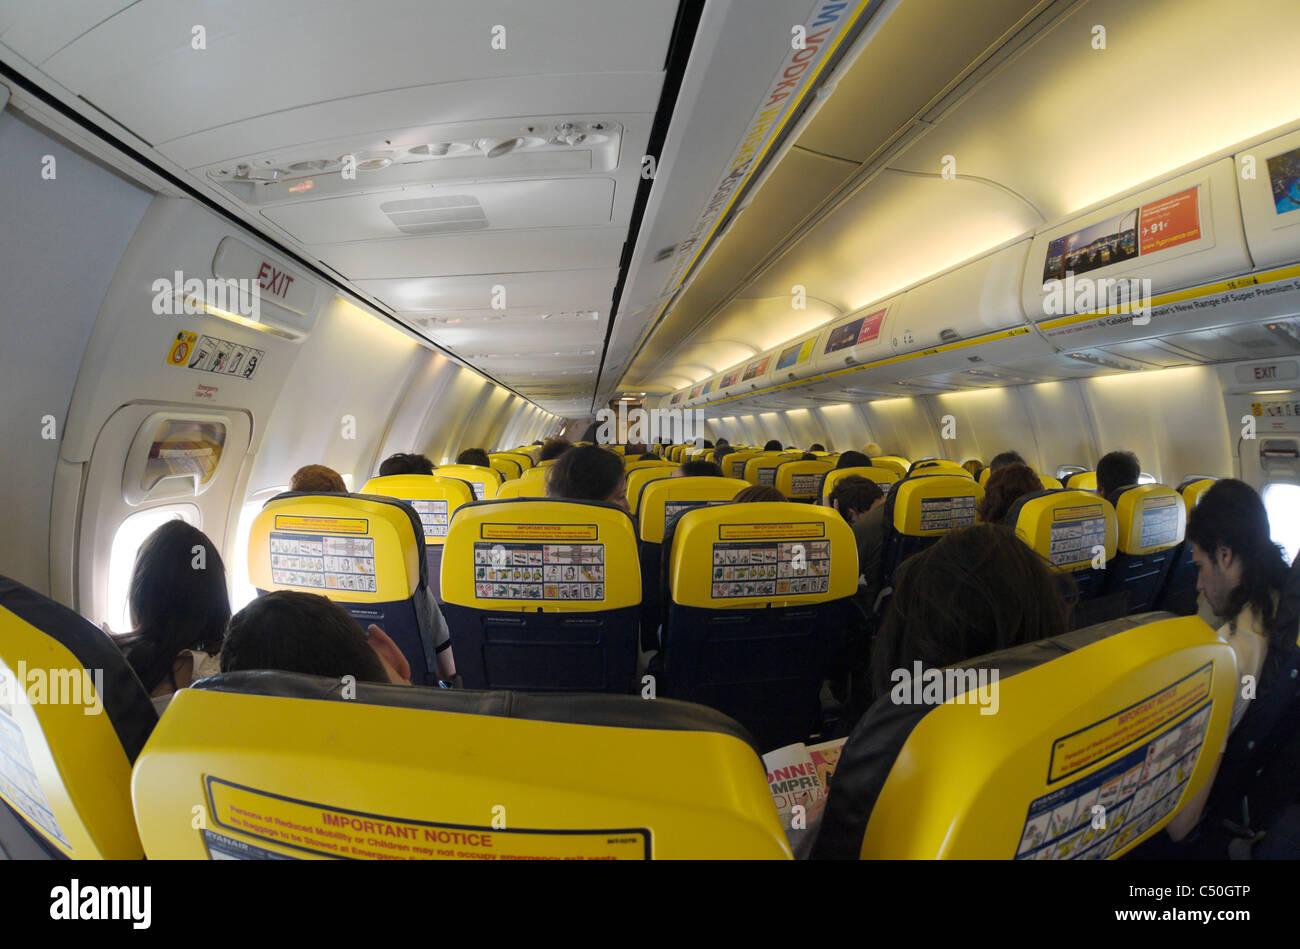 Boeing 737 800 aircraft inside image - Fisheye View Of Ryanair Boeing 737 800 Interior With Passengers Shallow Dof